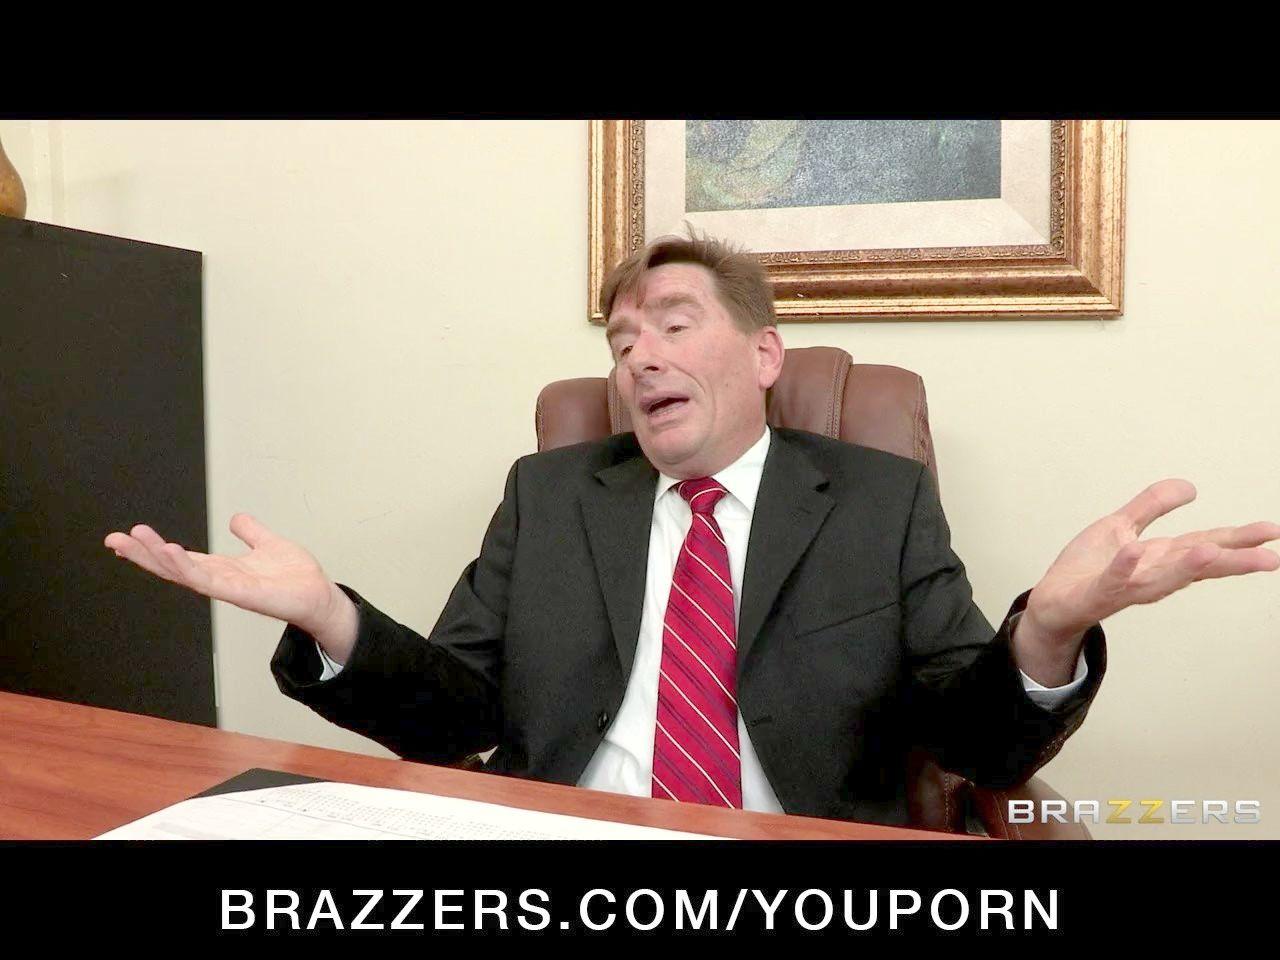 Peliculas lesvicas ligeros porno en español Peliculas Completas De Tiny Tove Jensen Video Porno